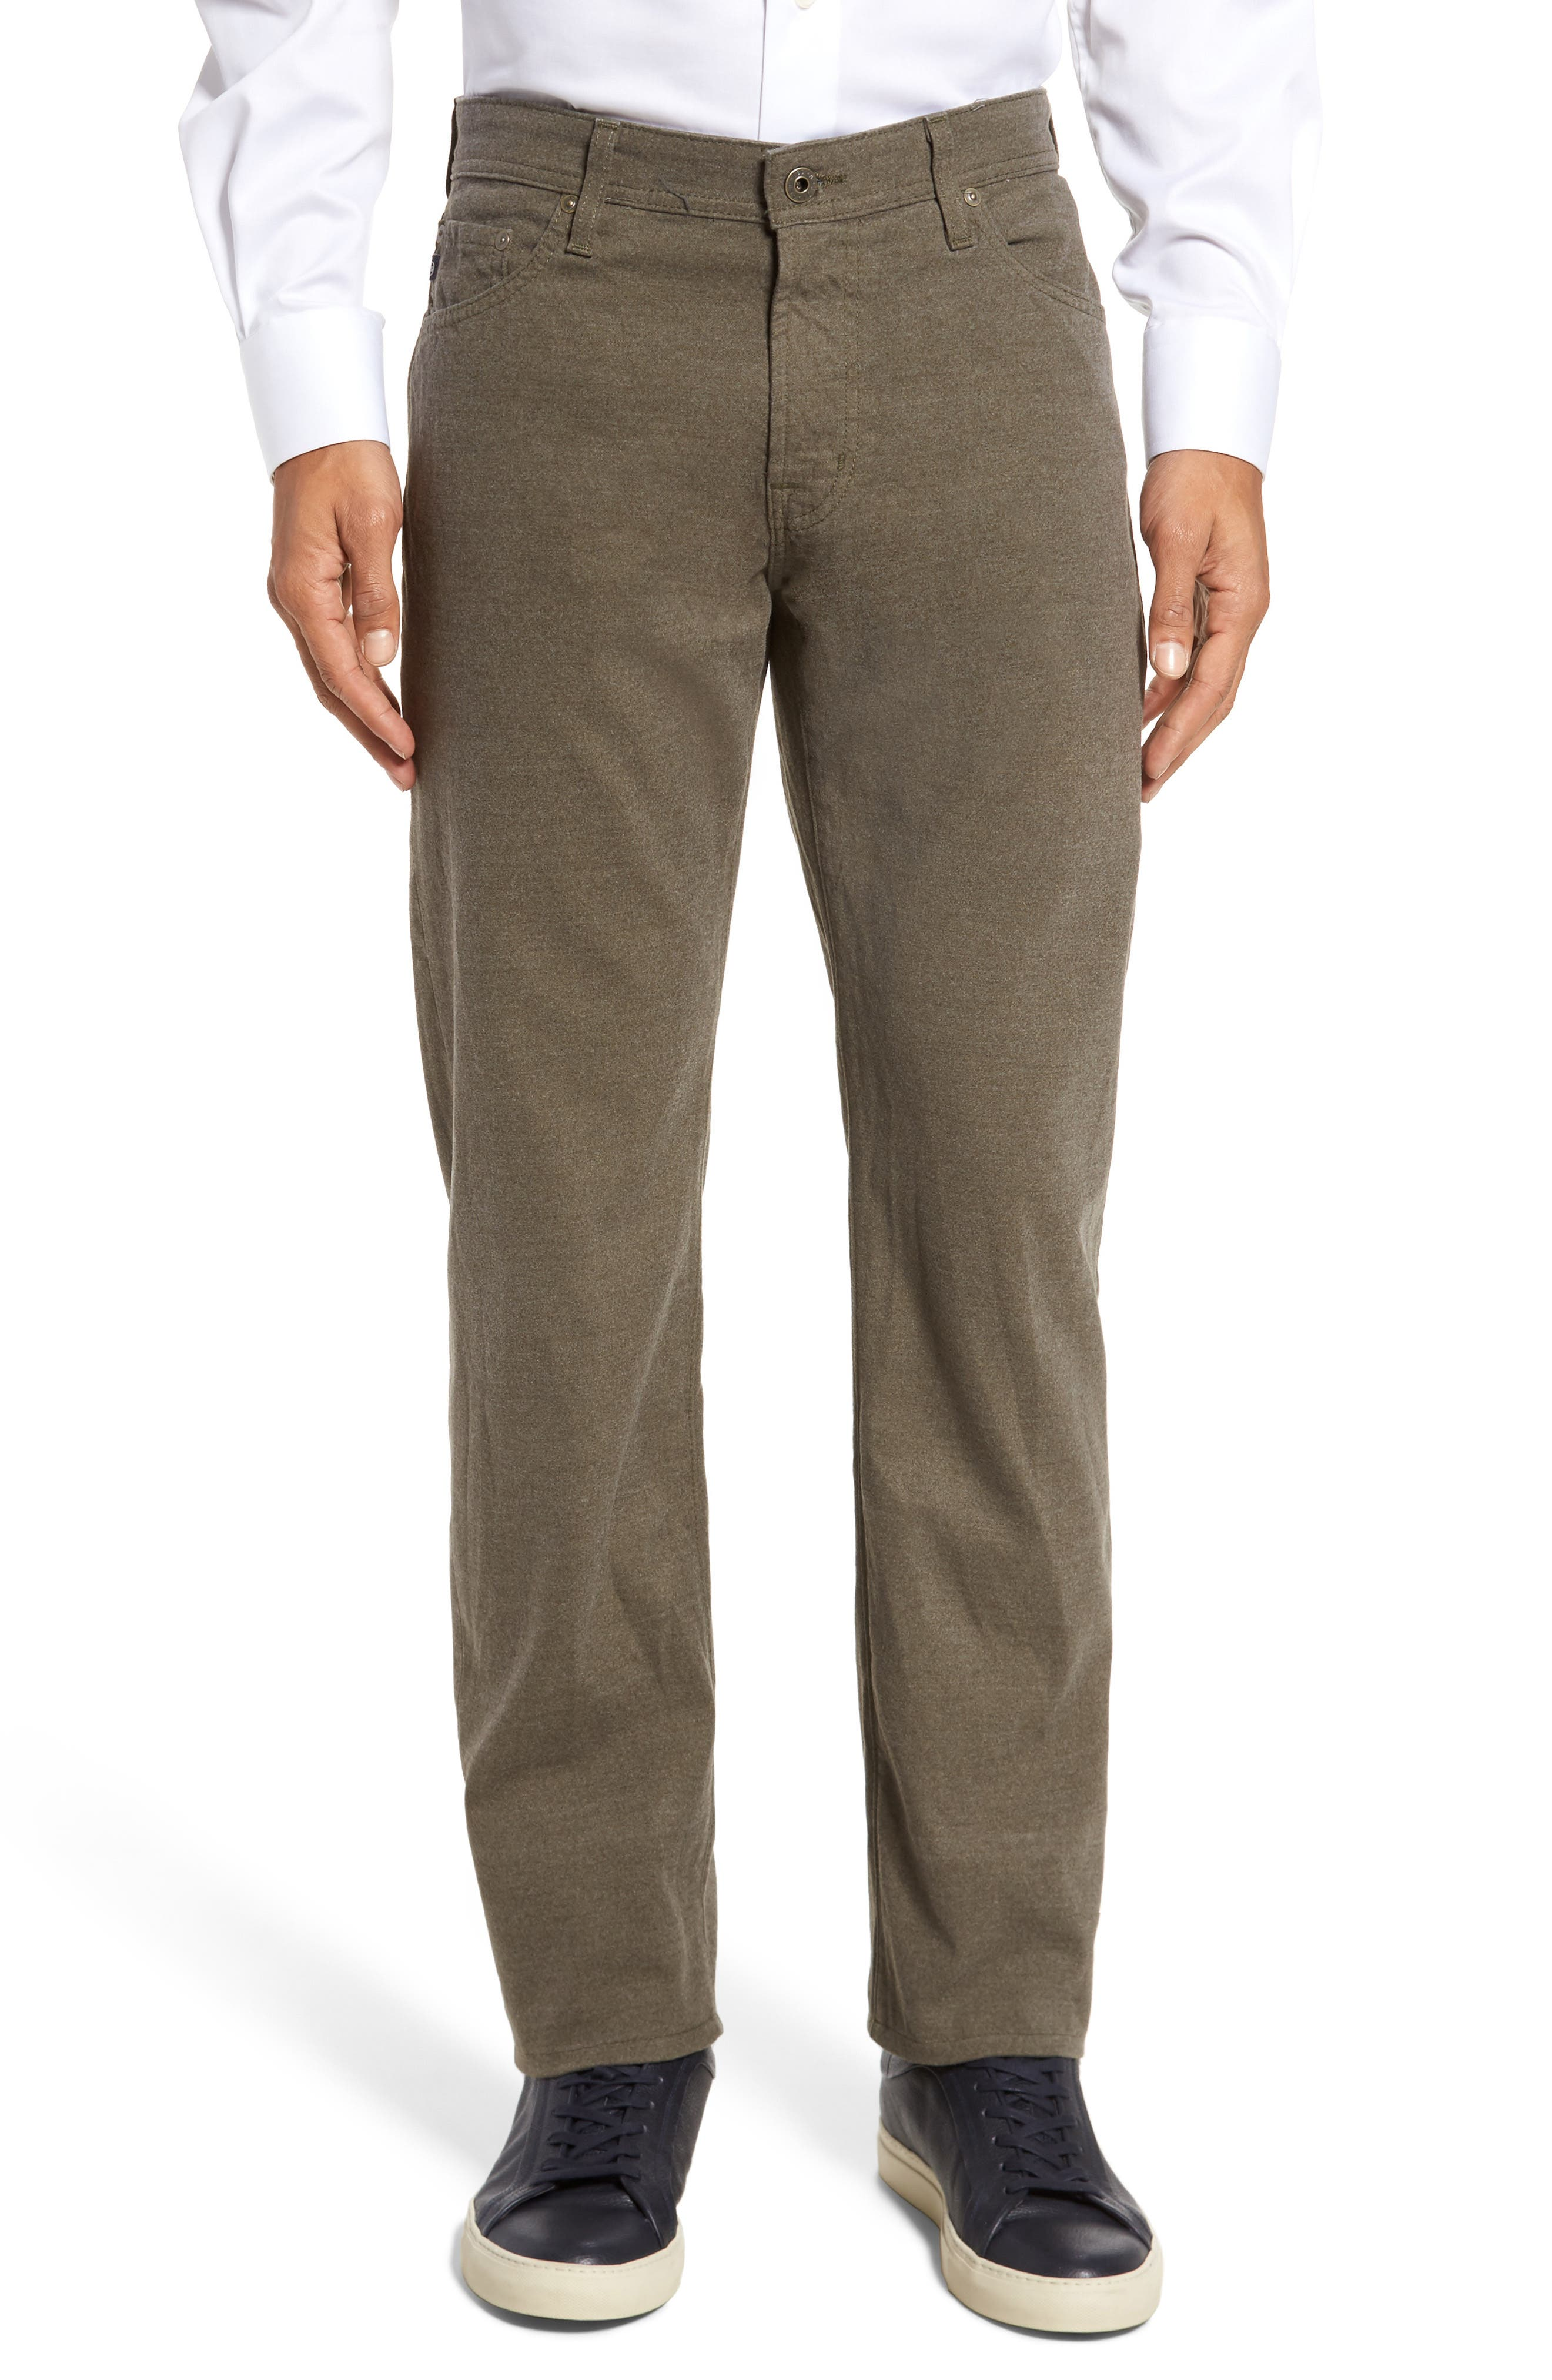 Alternate Image 1 Selected - AG Graduate Tailored Five-Pocket Straight Leg Pants